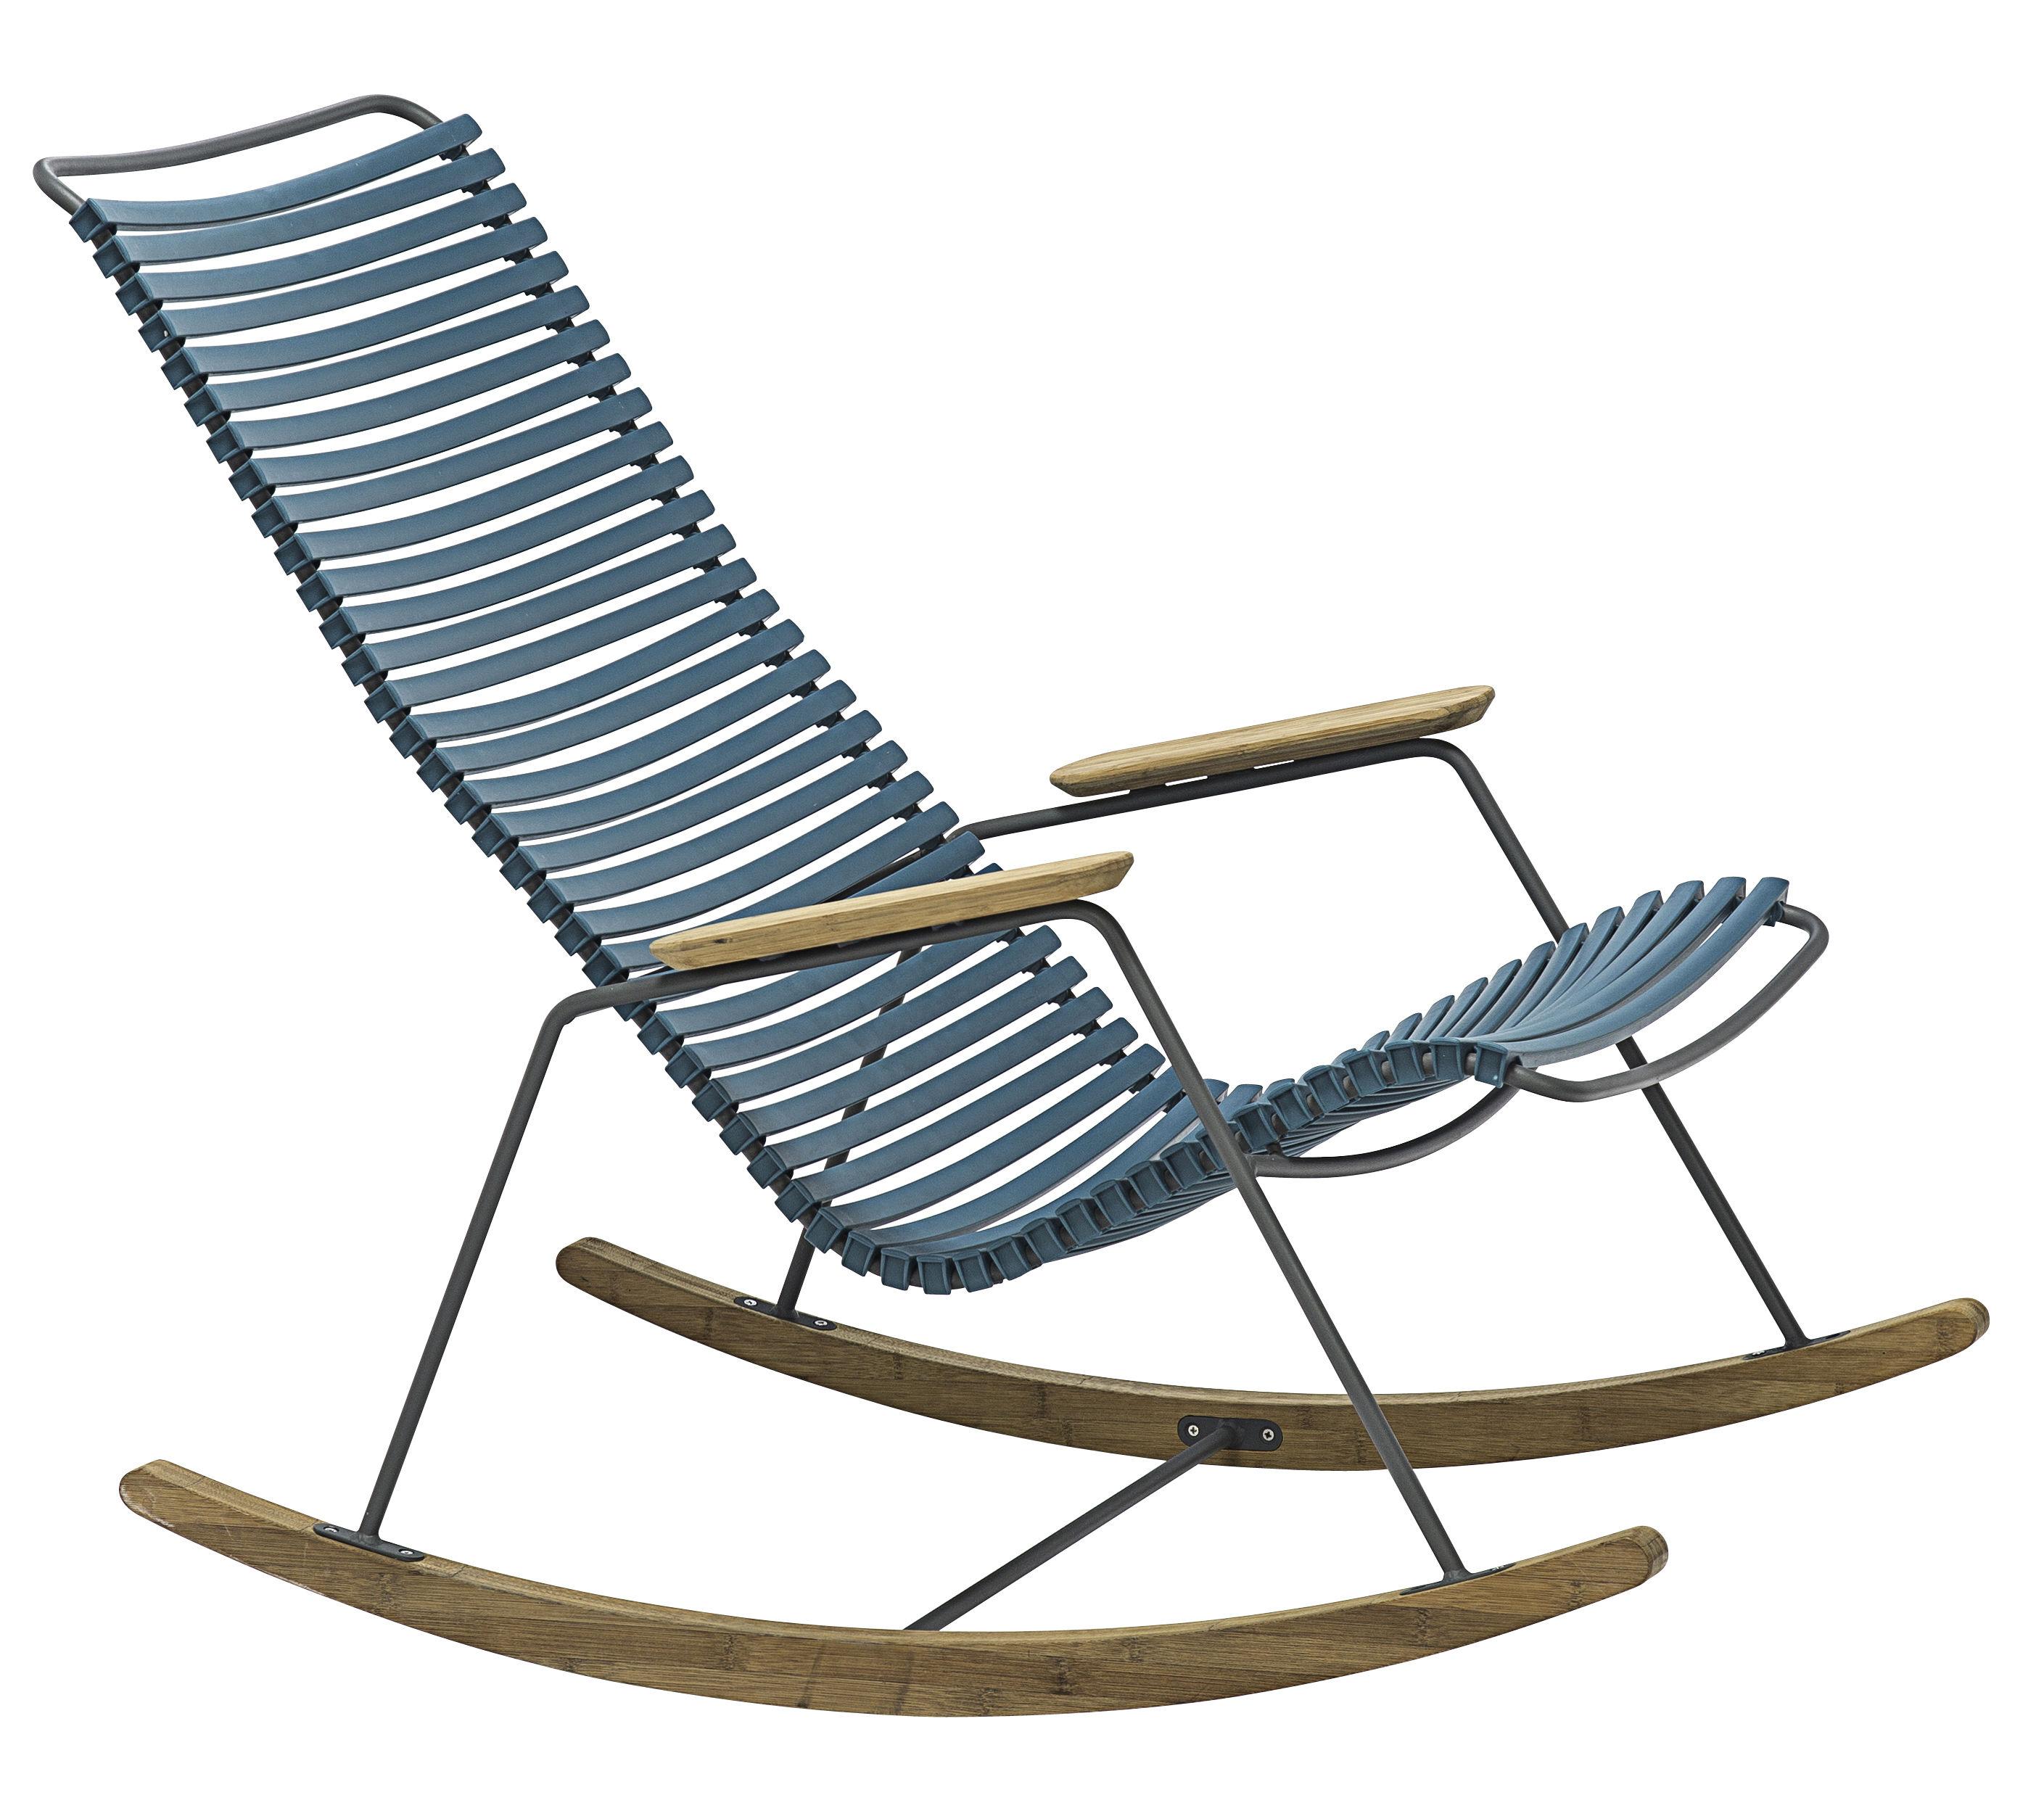 Outdoor - Sedie - Rocking chair Click / Plastica & bambù - Houe - Blu petrolio - Bambù, Materiale plastico, Metallo